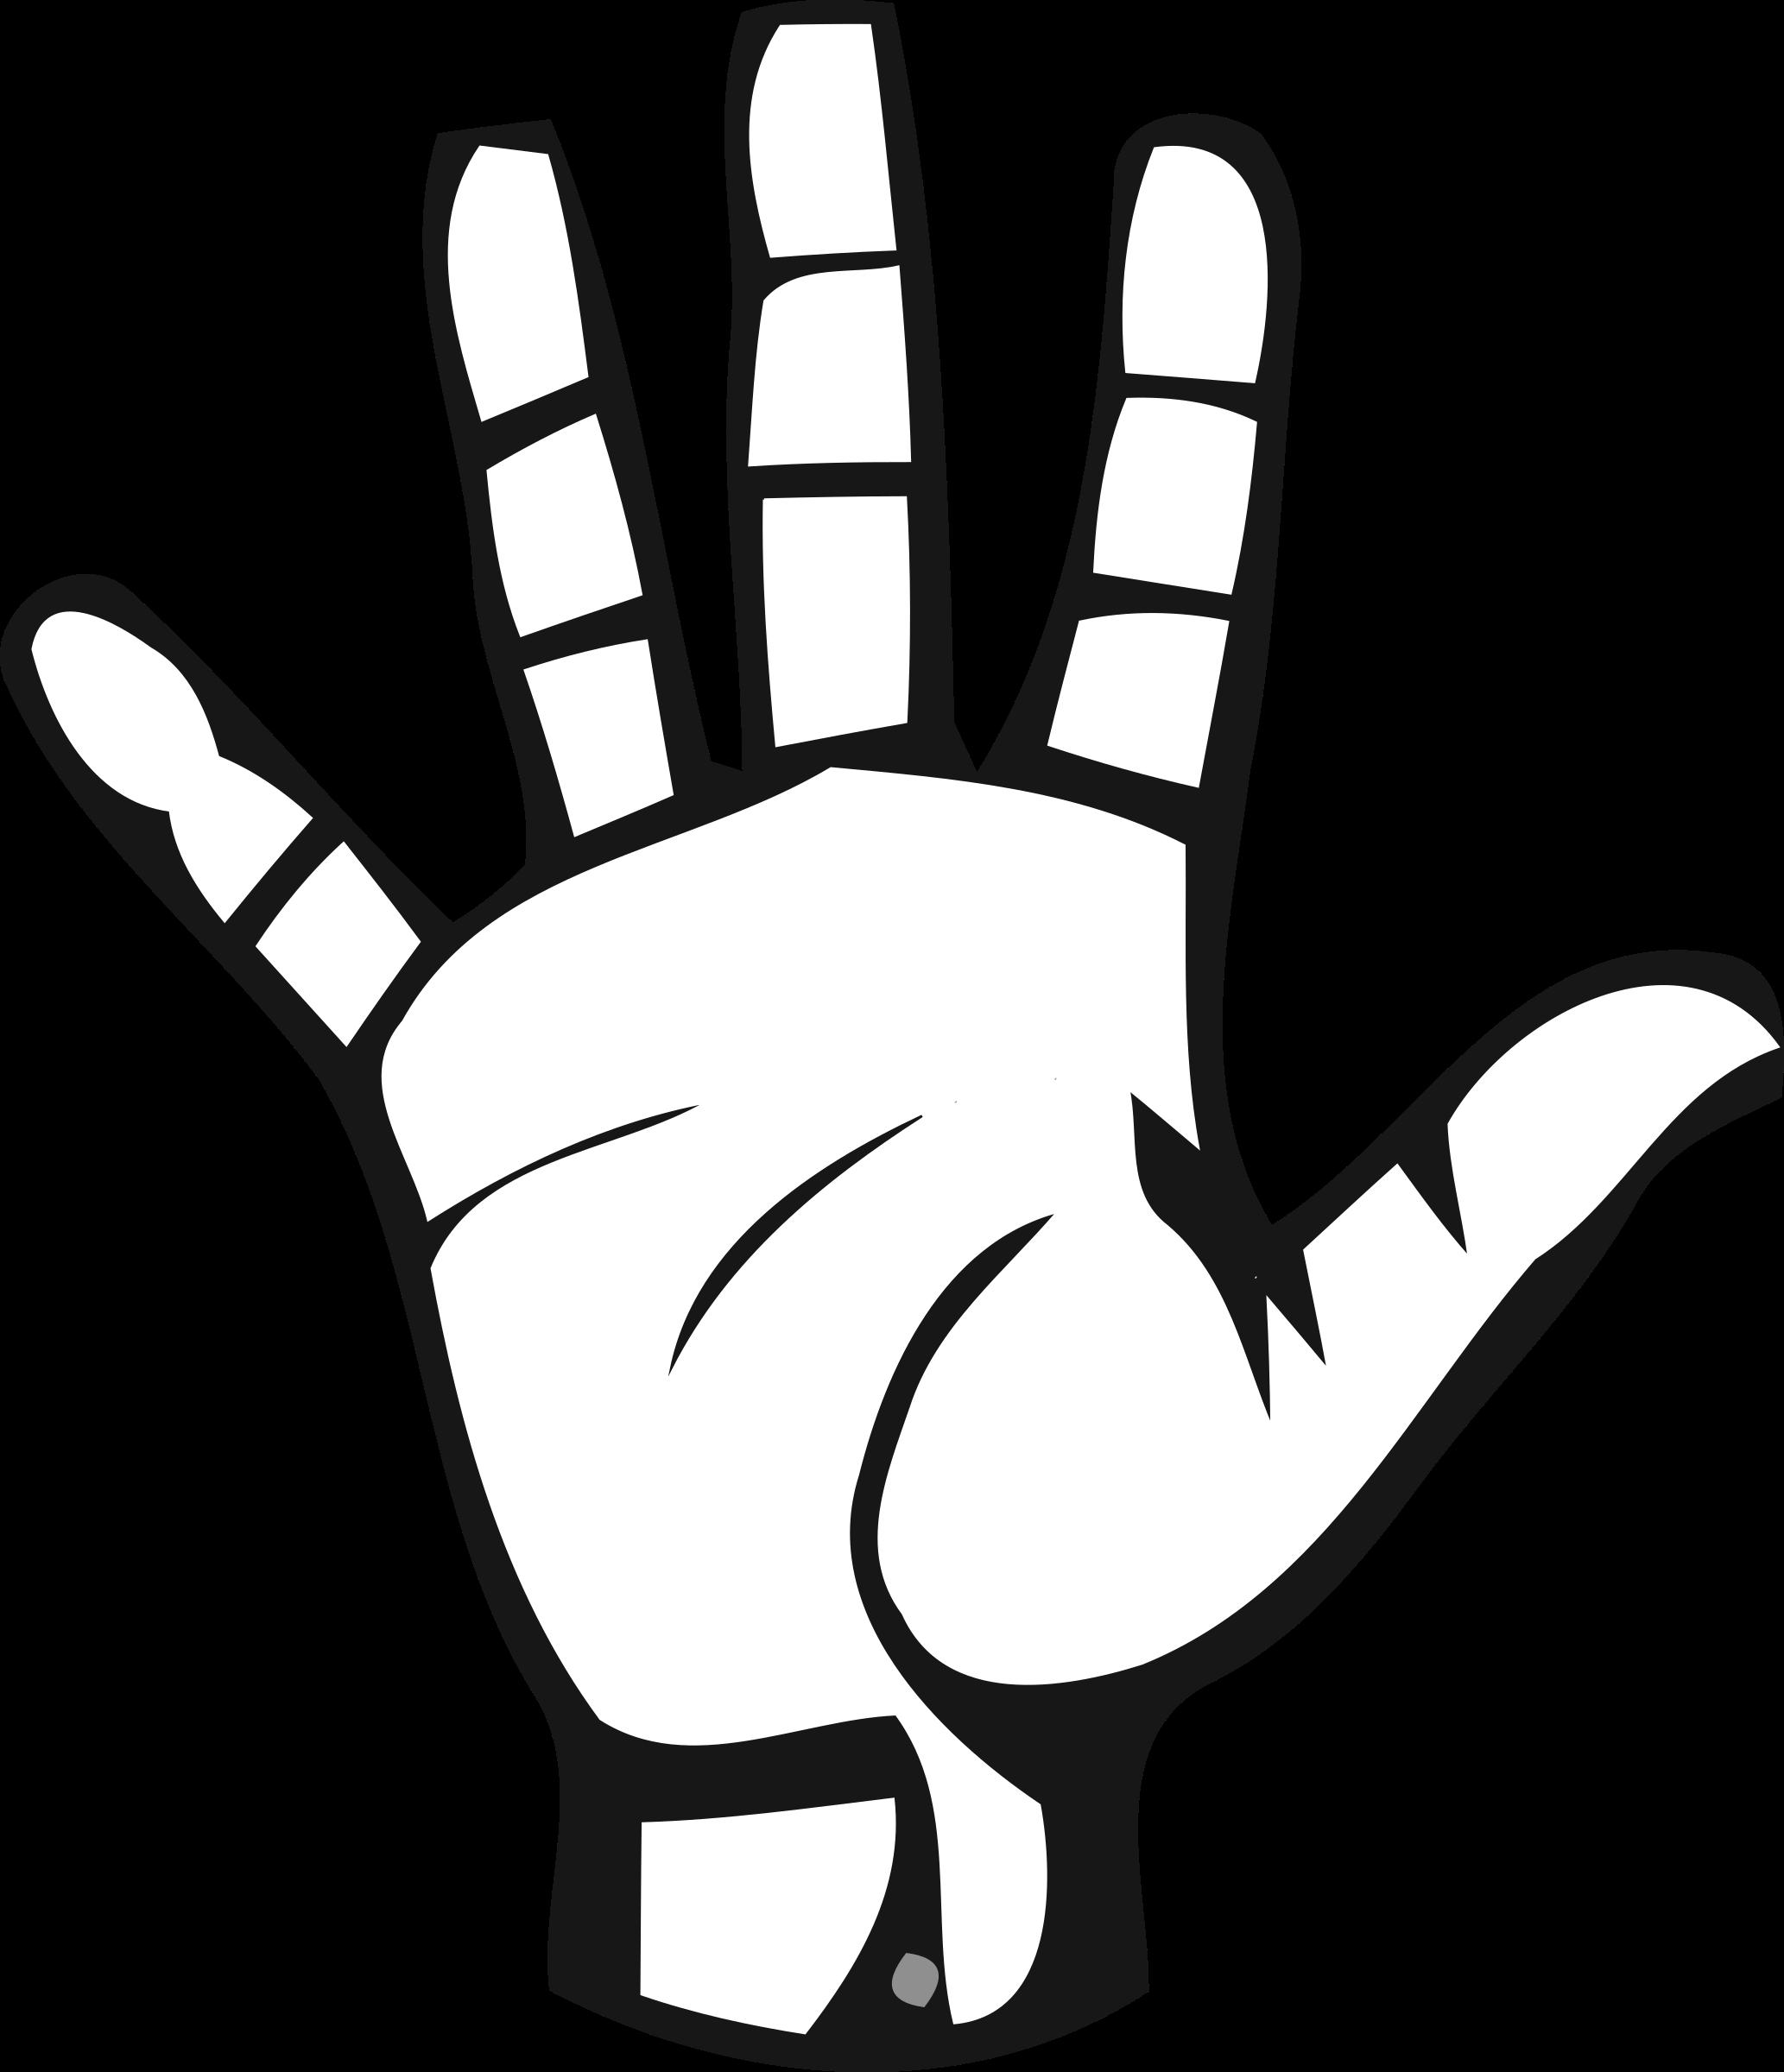 Clipart sign language jpg Clipart - Deaf Alphabet 5 jpg